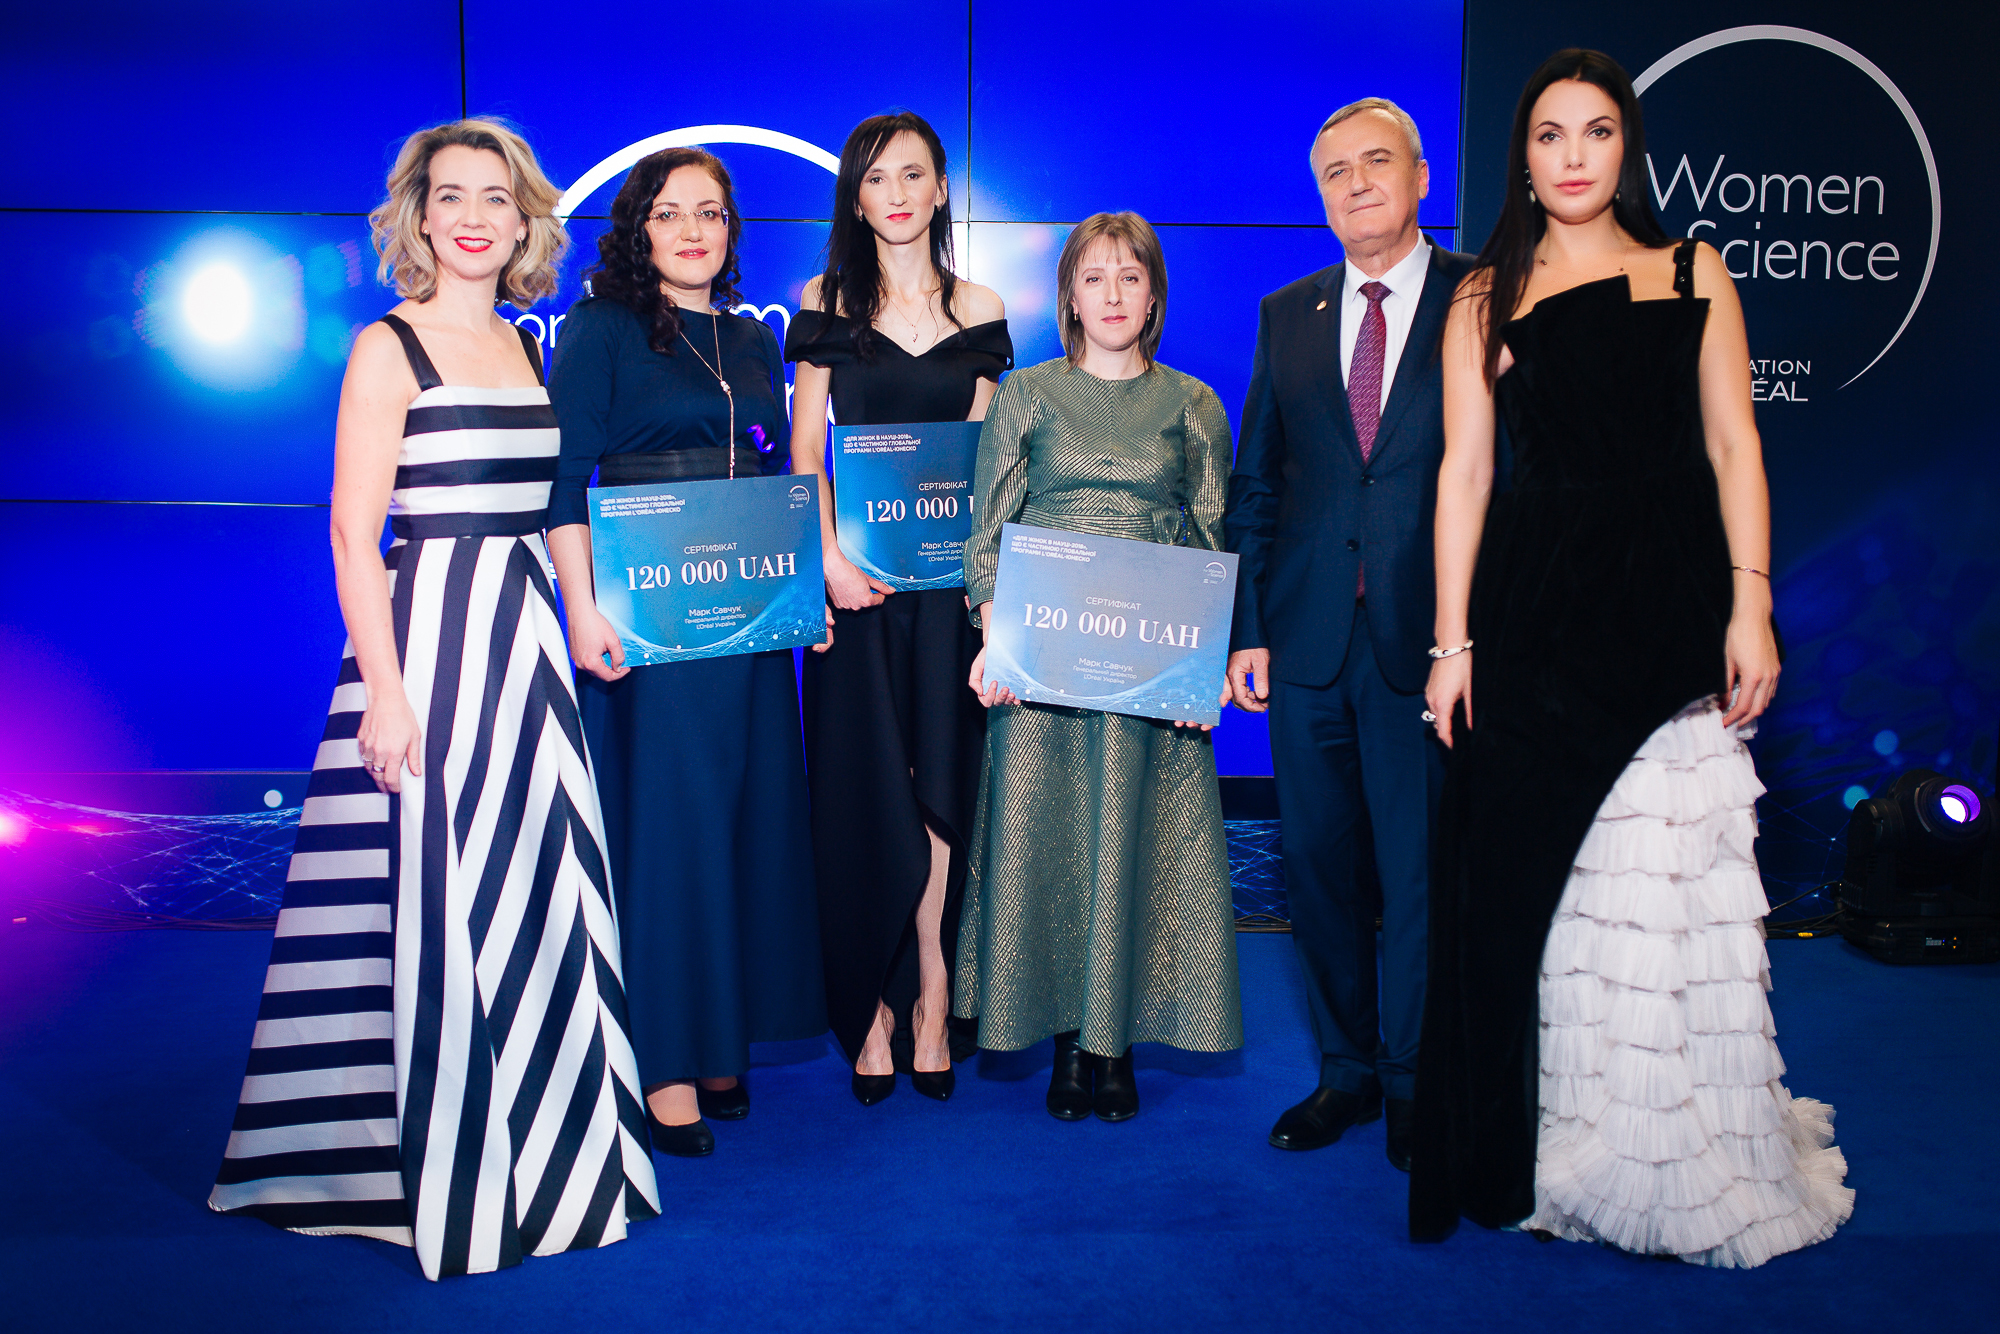 http://www.nas.gov.ua/logo/PhotoNews/LOreal_prize_for_women_in_science_Ukraine_2018_6.jpg